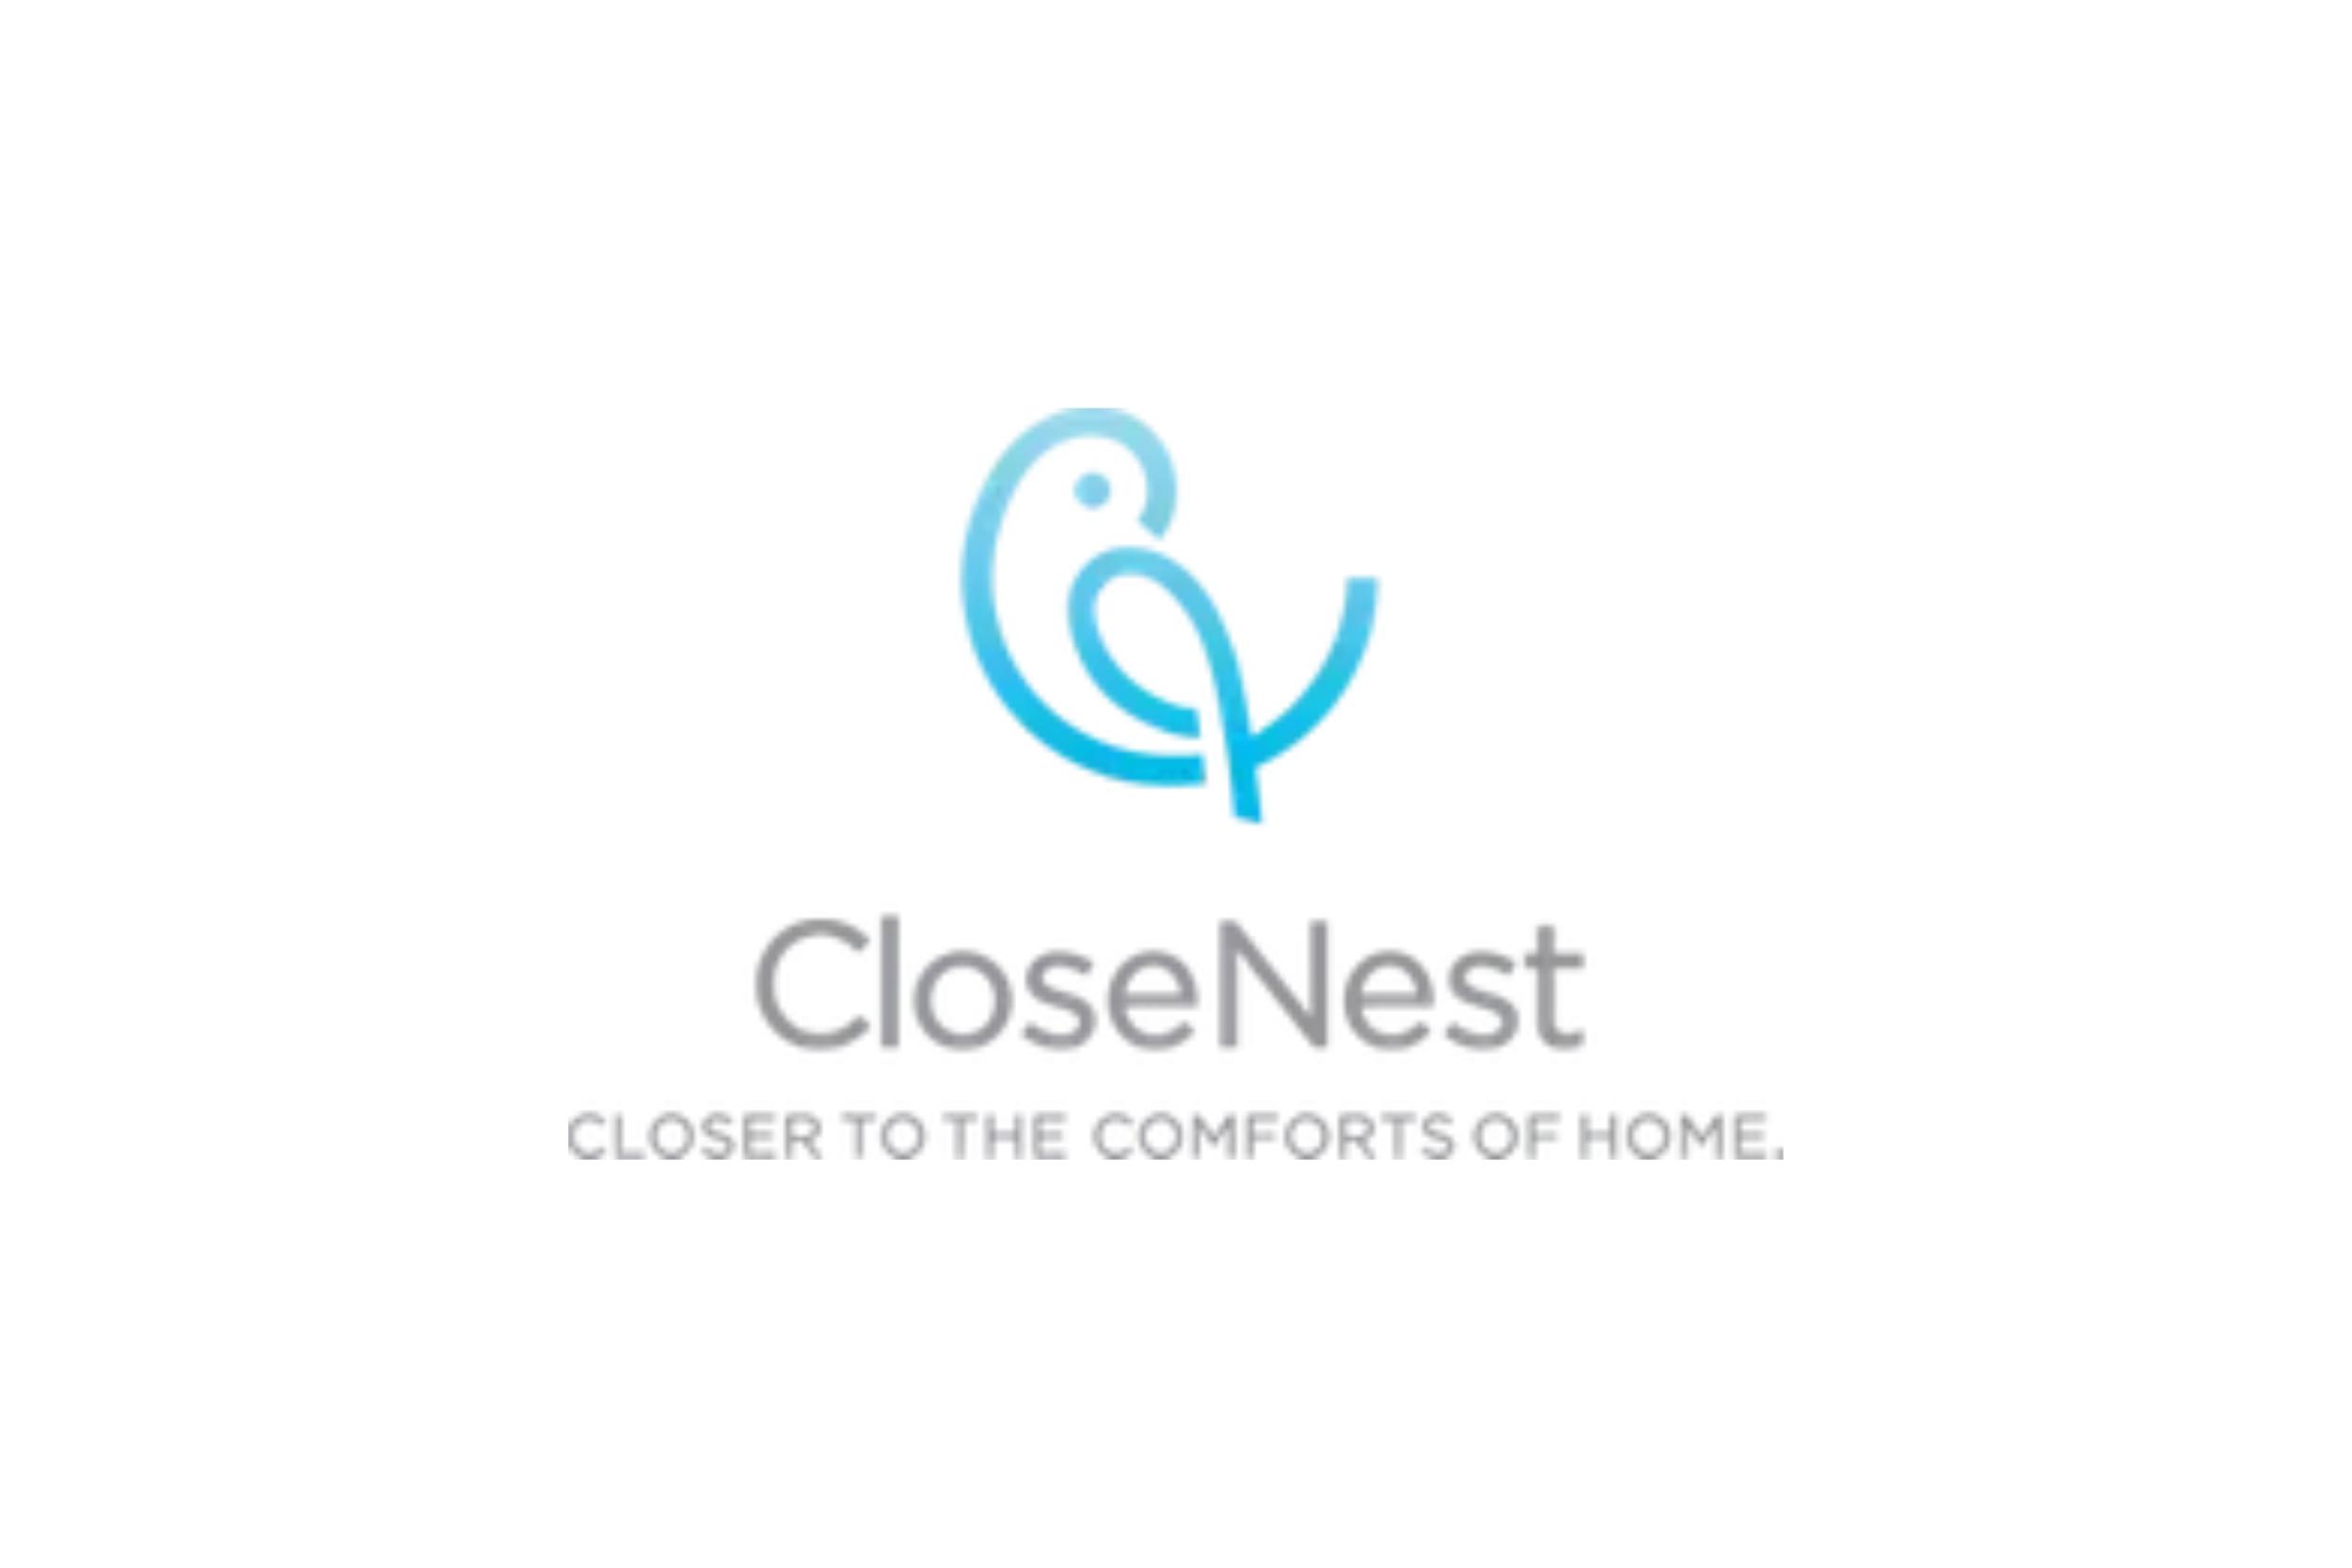 CloseNest